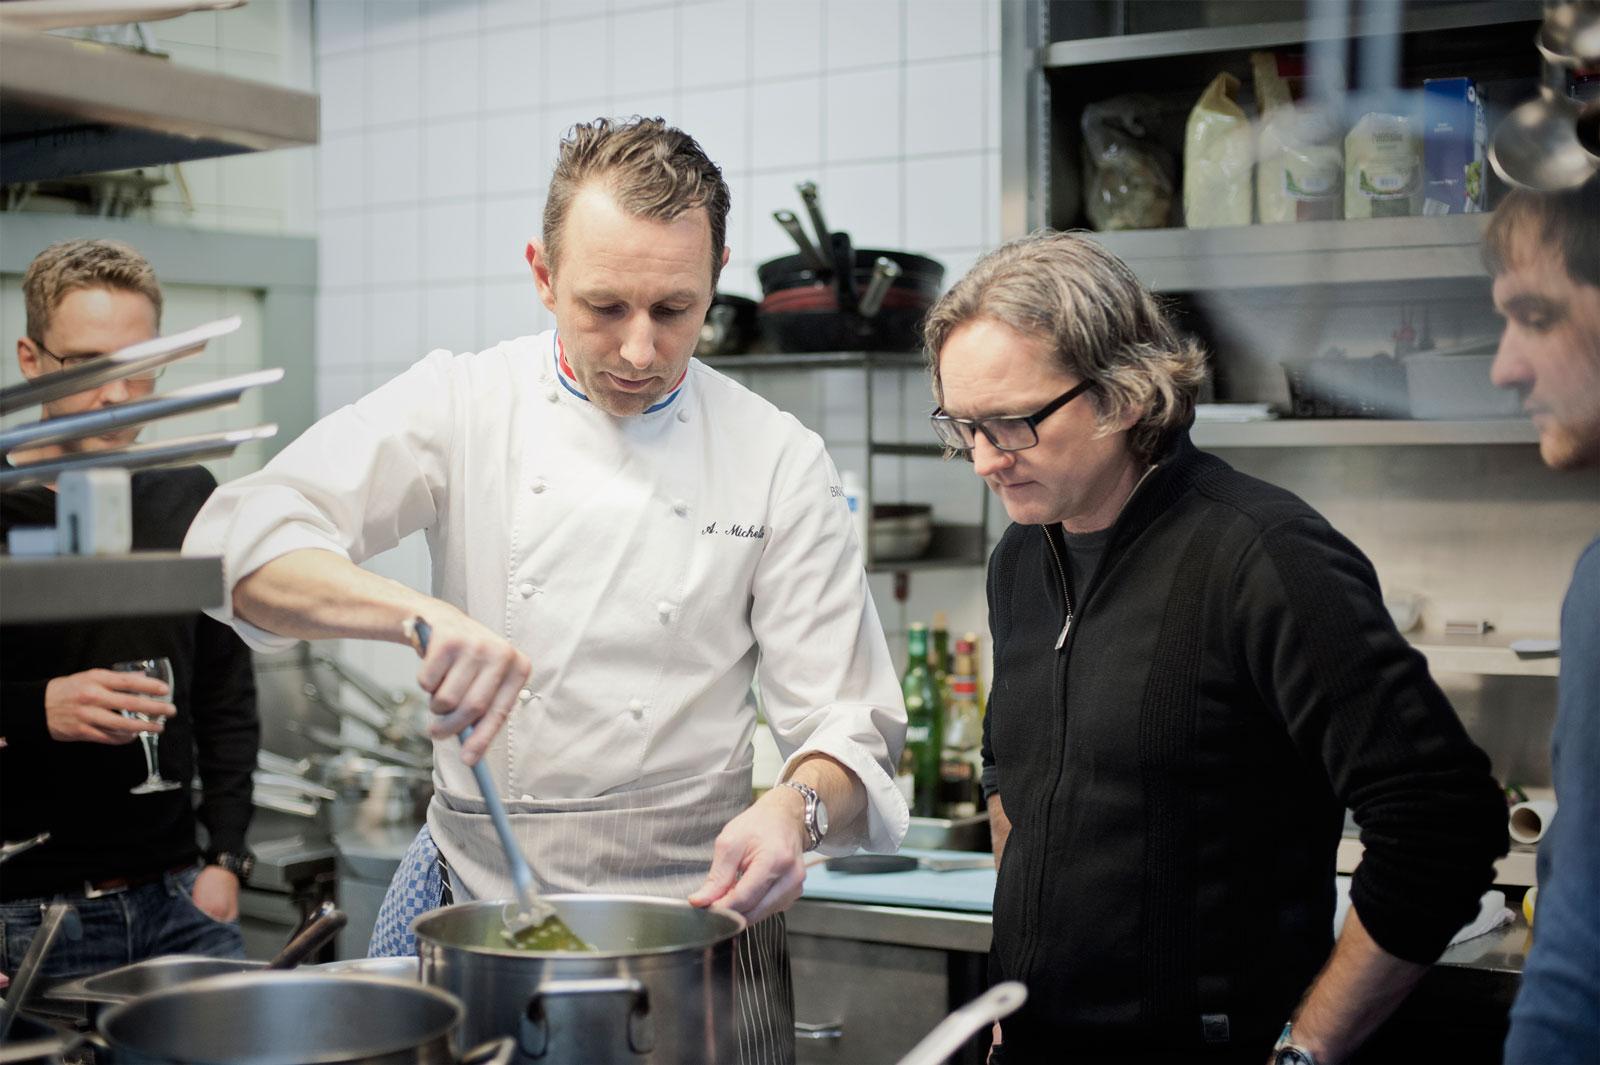 KR-ONE Kocht - mit Alain Michelis - Sterne-Know-how im rustikalen Gewand